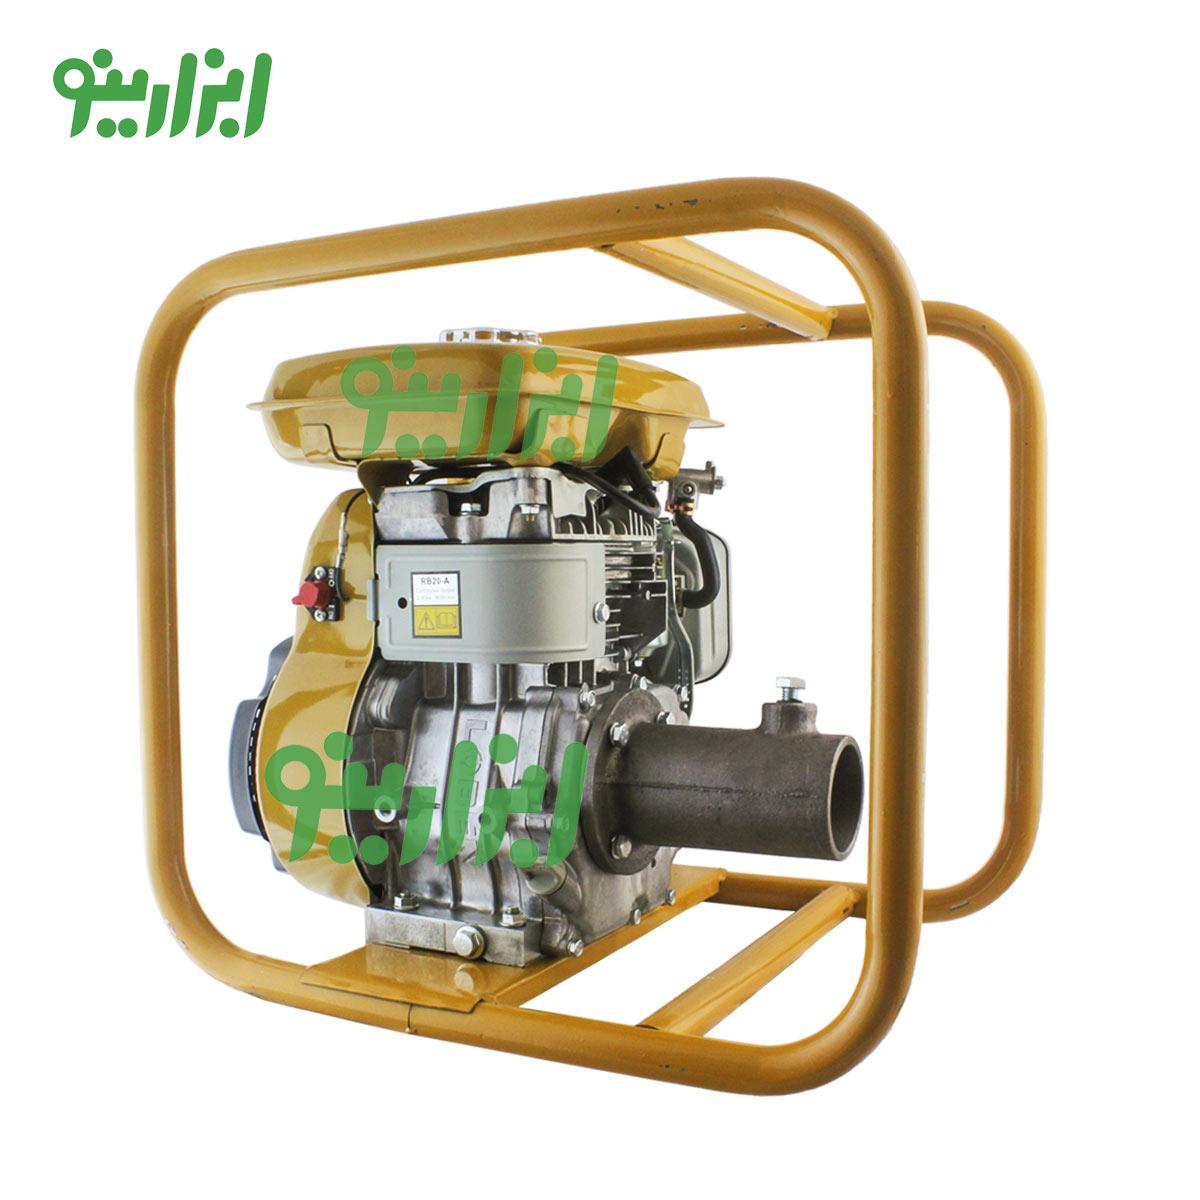 موتور ویبراتور بنزینی روبین (شاسی ثابت)